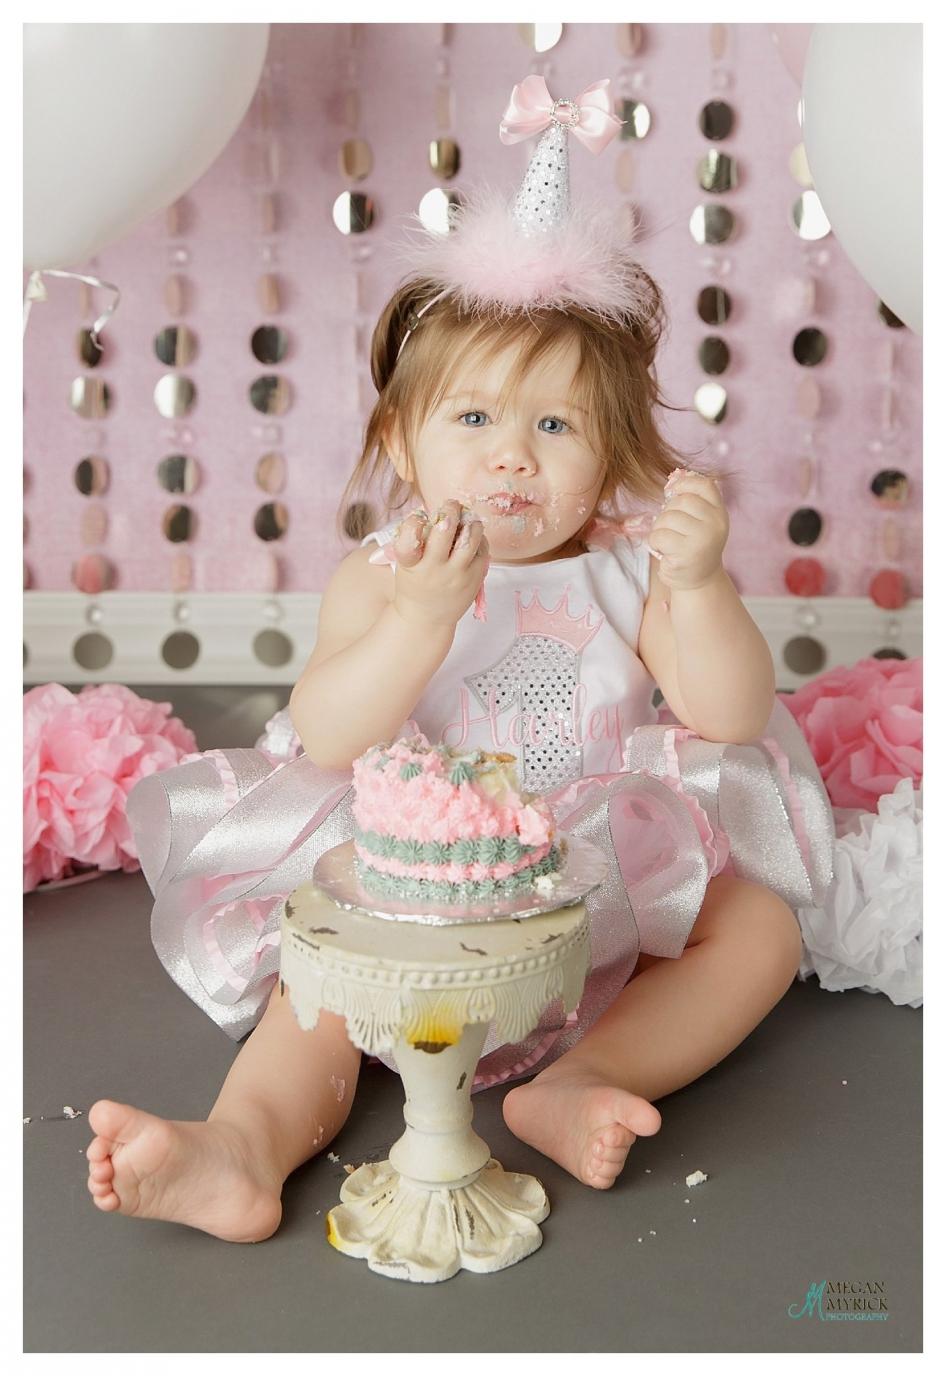 Pooler First Birthday Photographer|Megan Myrick Photography|www.meganmyrickphotography.com